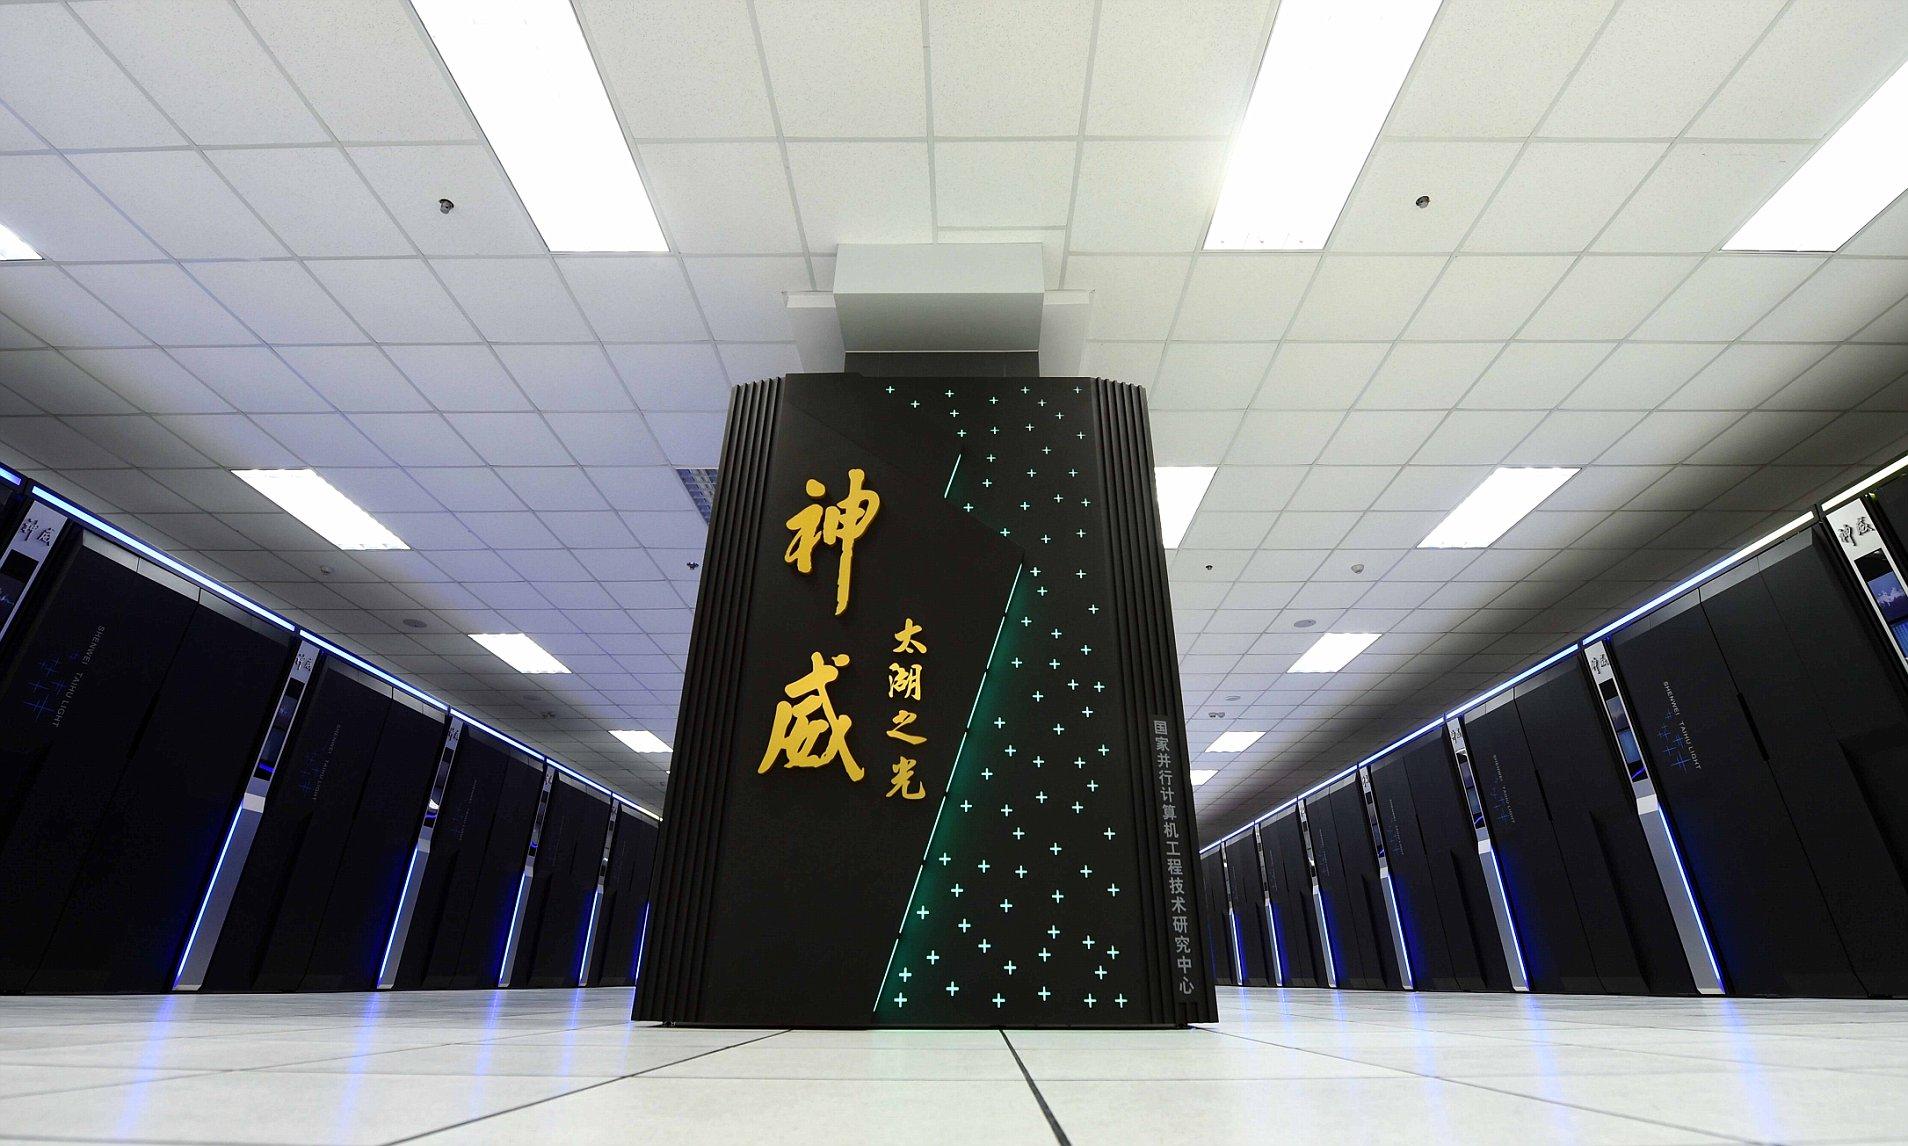 Sunway TaihuLight Supercomputer, Wuxi, Jiangsu Province, China - 20 Jun 2016